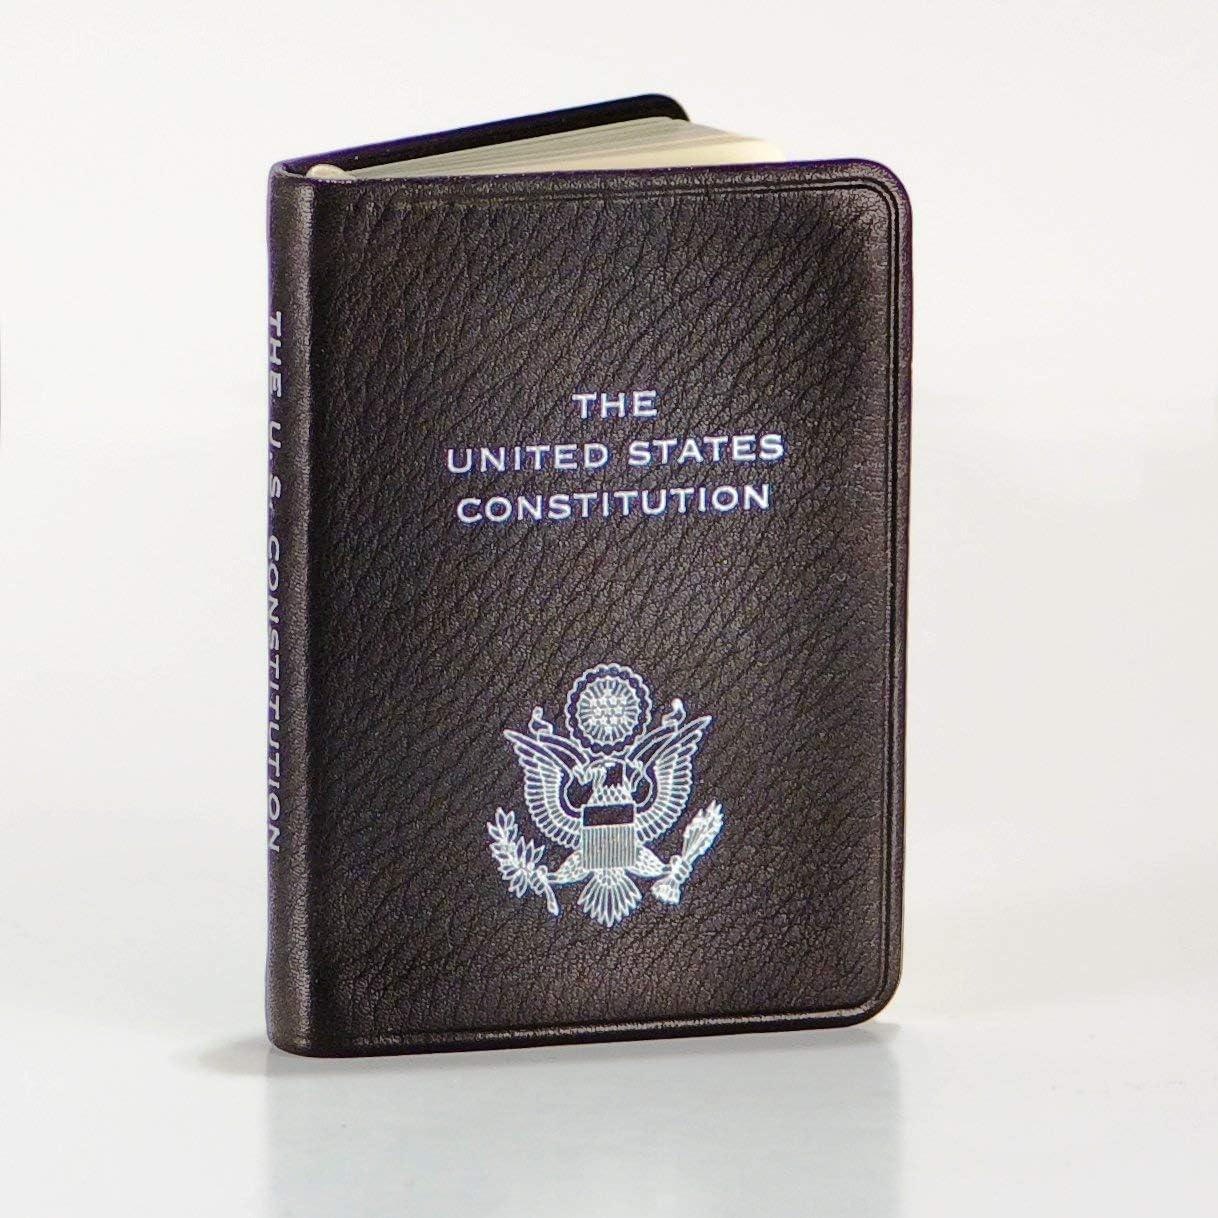 "Fine Keepsakes United States Constitution, Pocket Size, Genuine Leather, Embossed American Eagle, 2-3/4"" X 3-3/4"", Black"